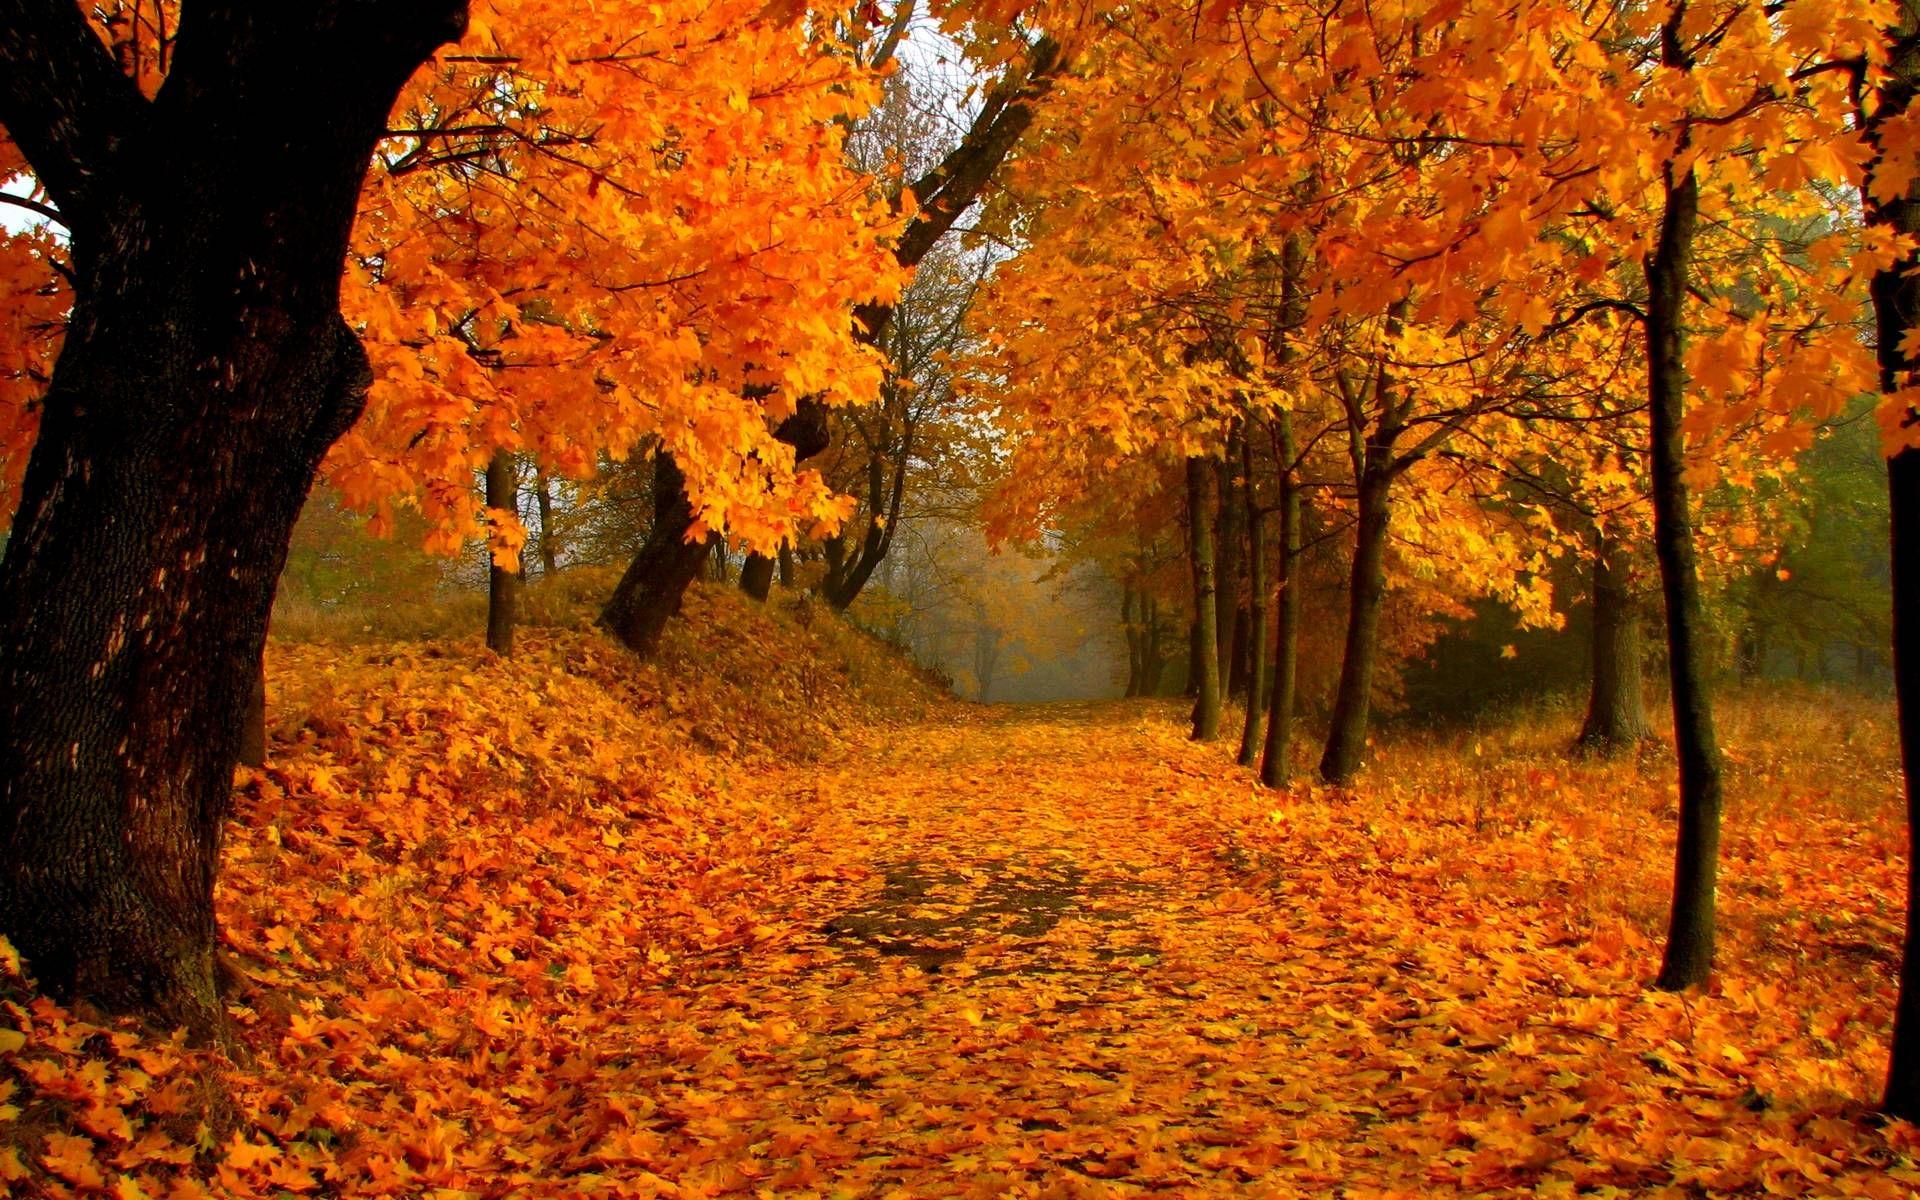 Free Download Fall Foliage Wallpaper Scenery Wallpaper Autumn Scenery Scenery Photos